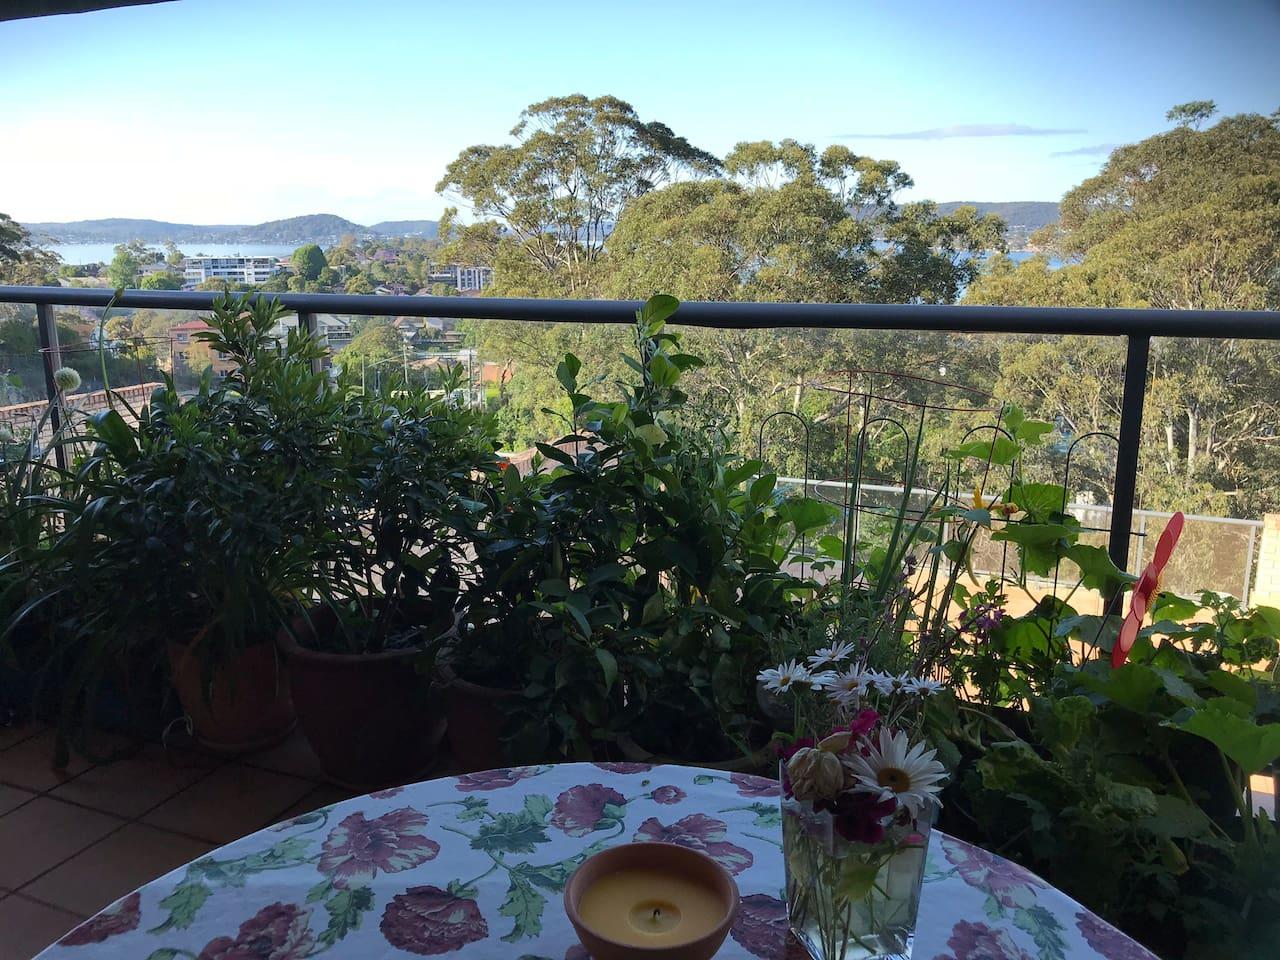 Breakfast on the verandah overlooking the views.